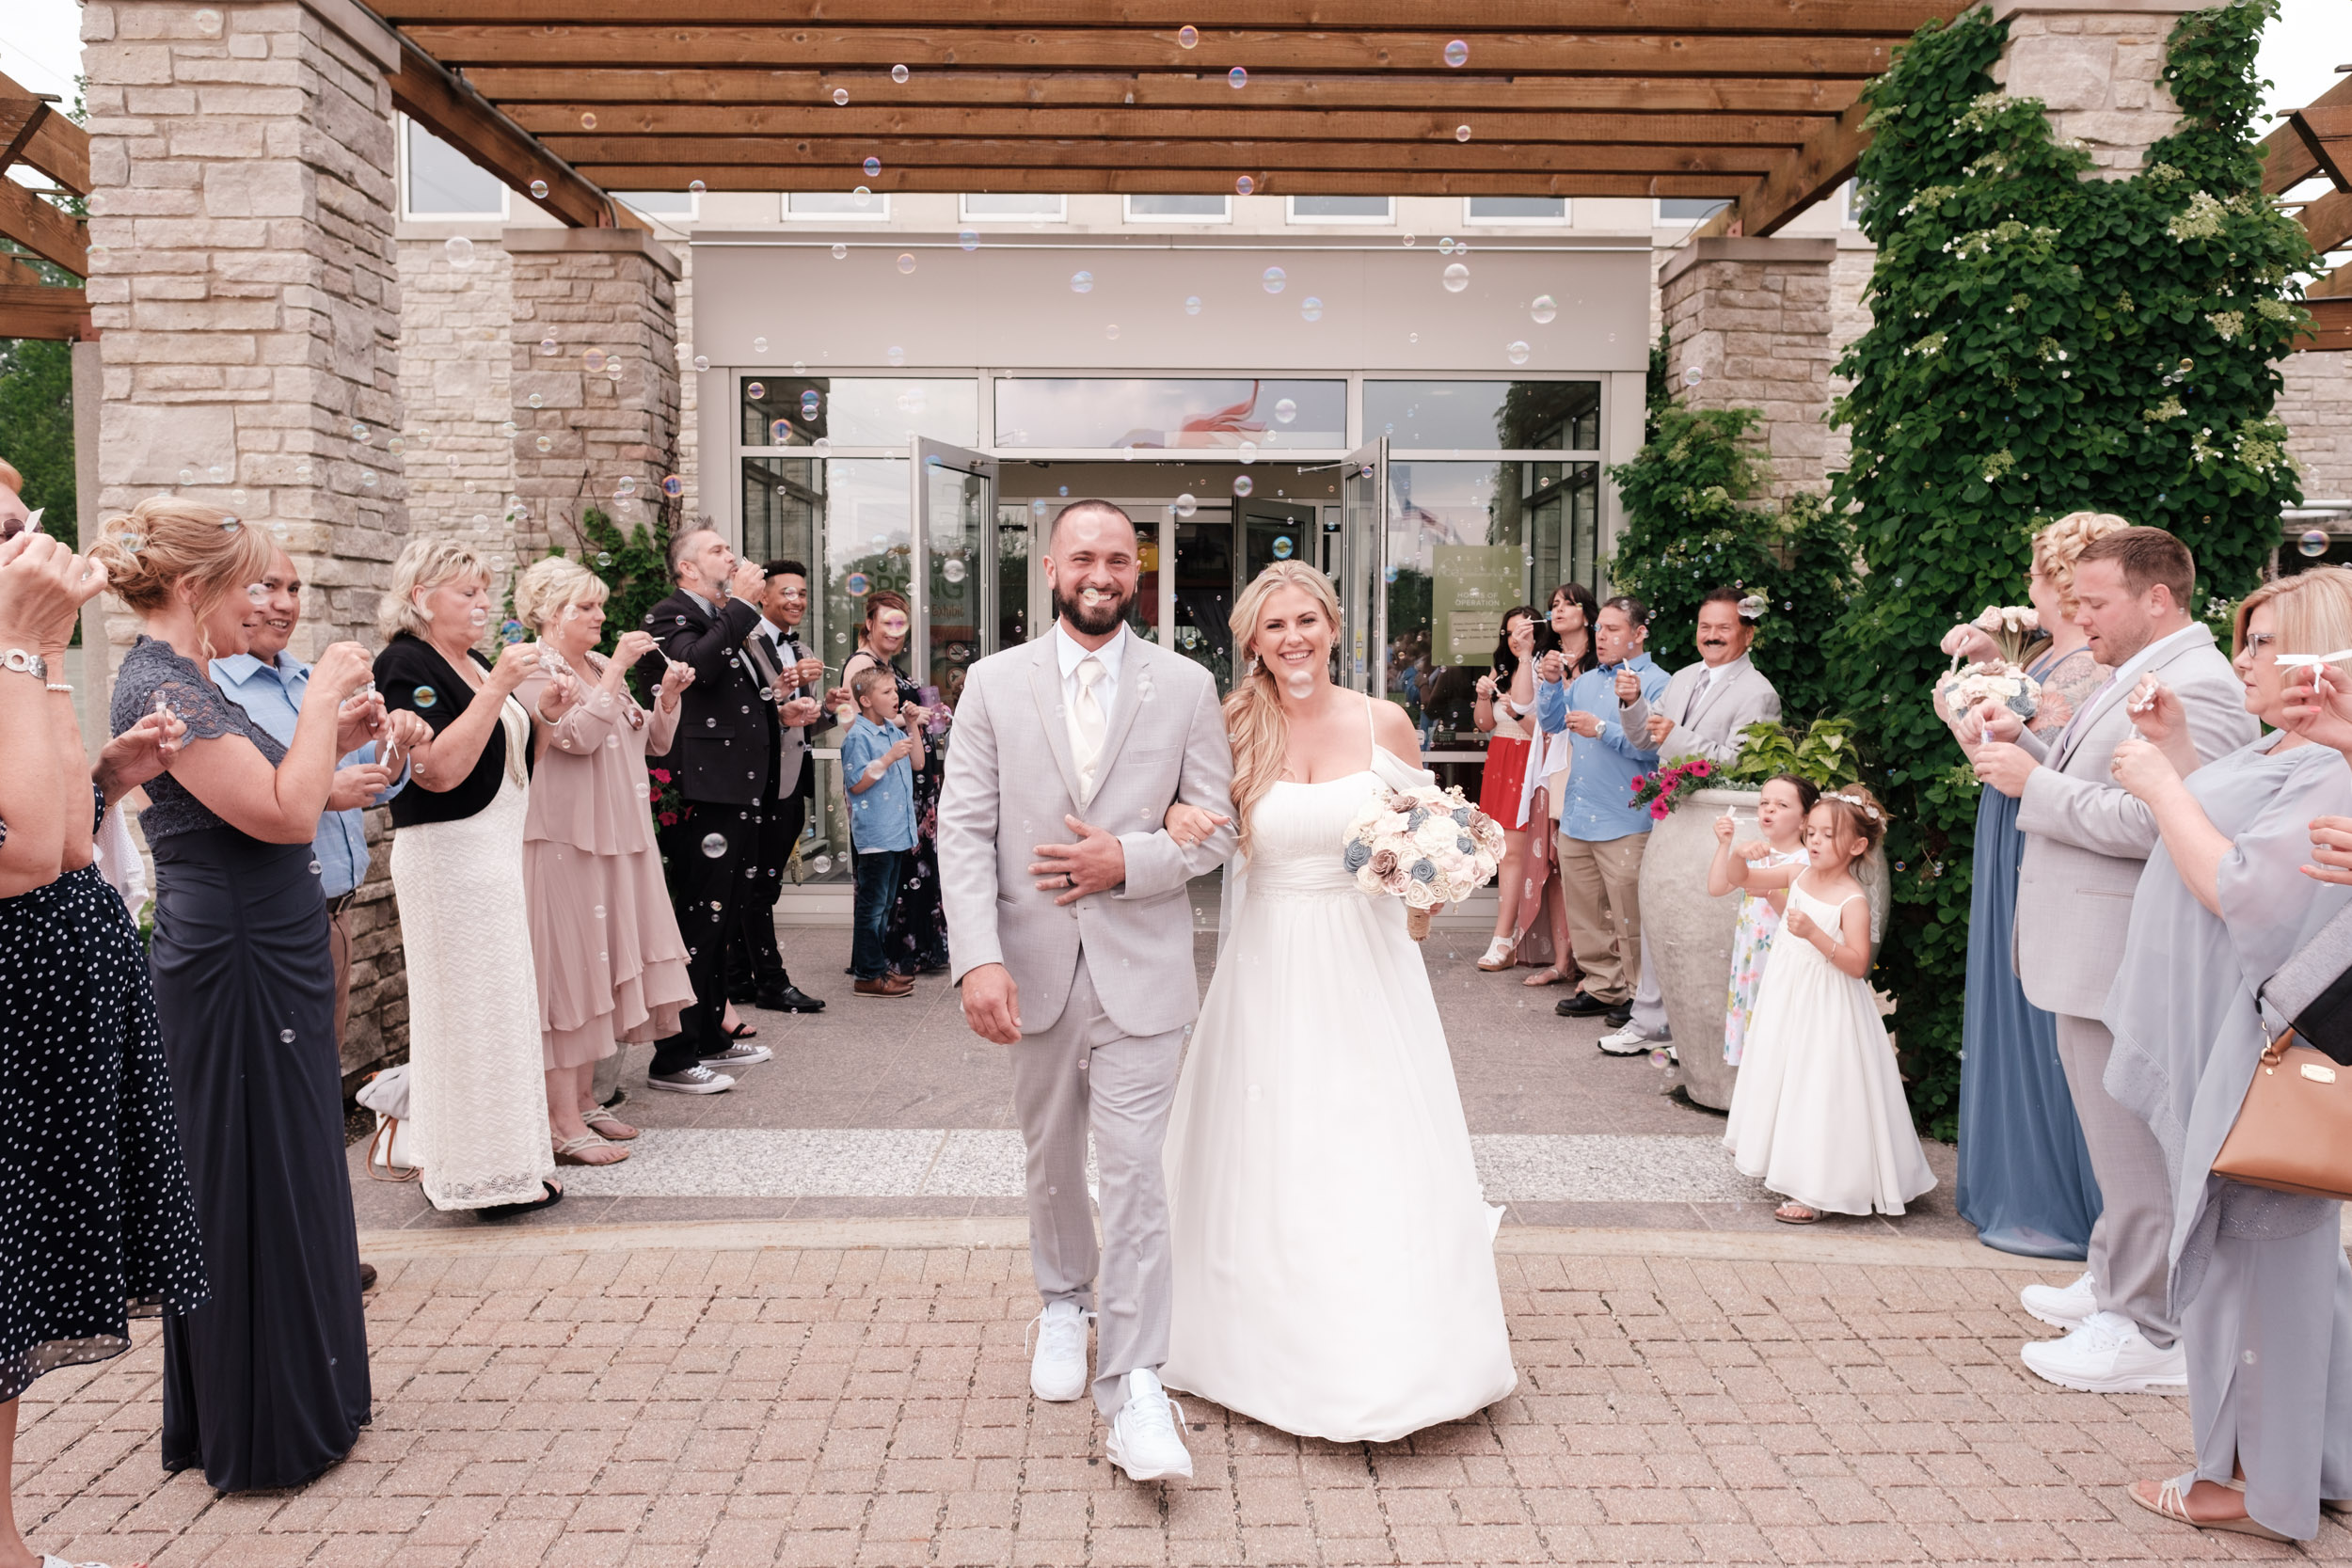 19-06-01 Megan Josh - Nicholas Conservatory Wedding-42.jpg